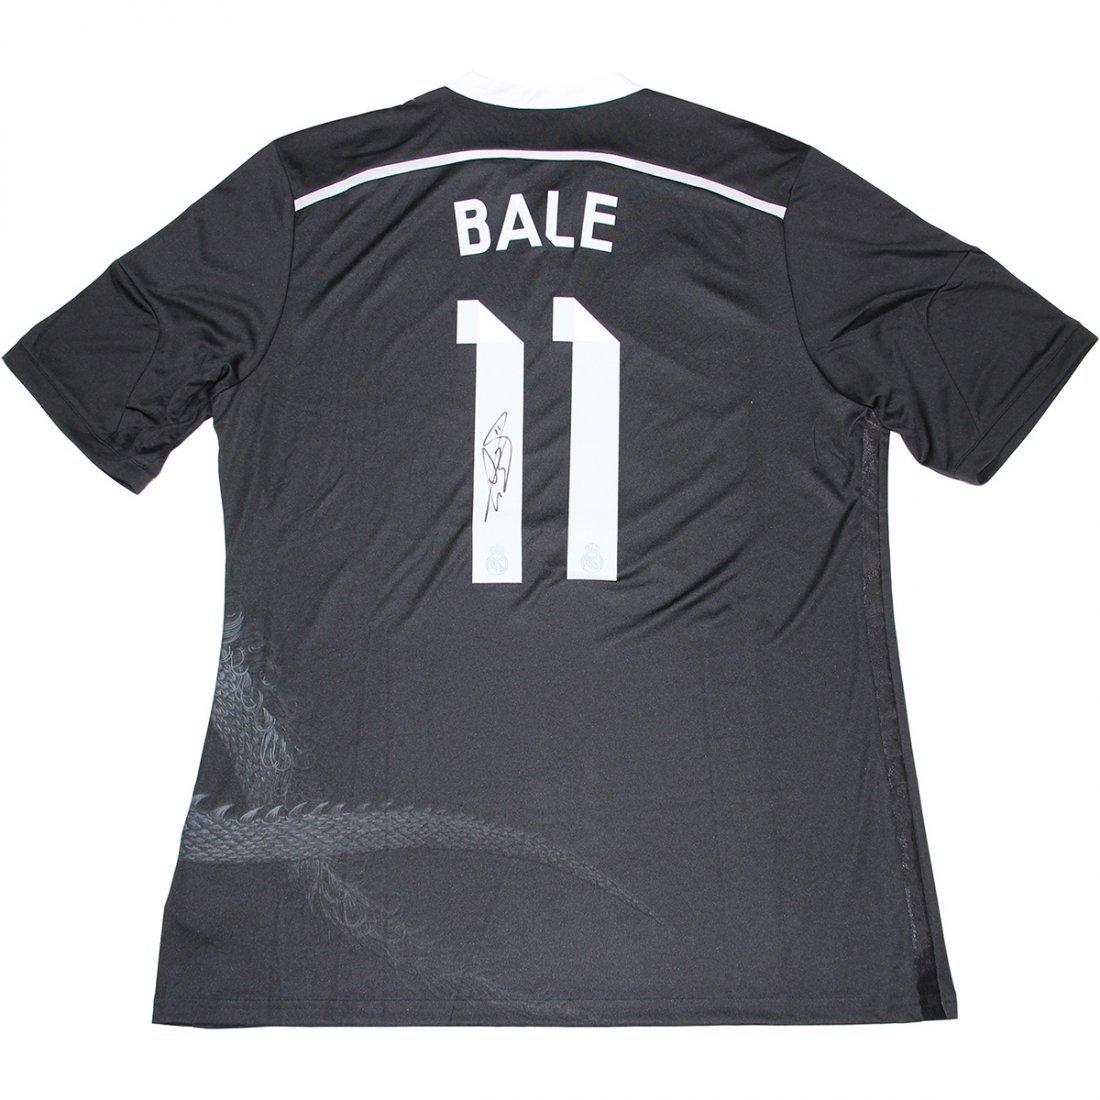 Gareth Bale Signed 2014/15 Real Madrid Away Jersey (Ico